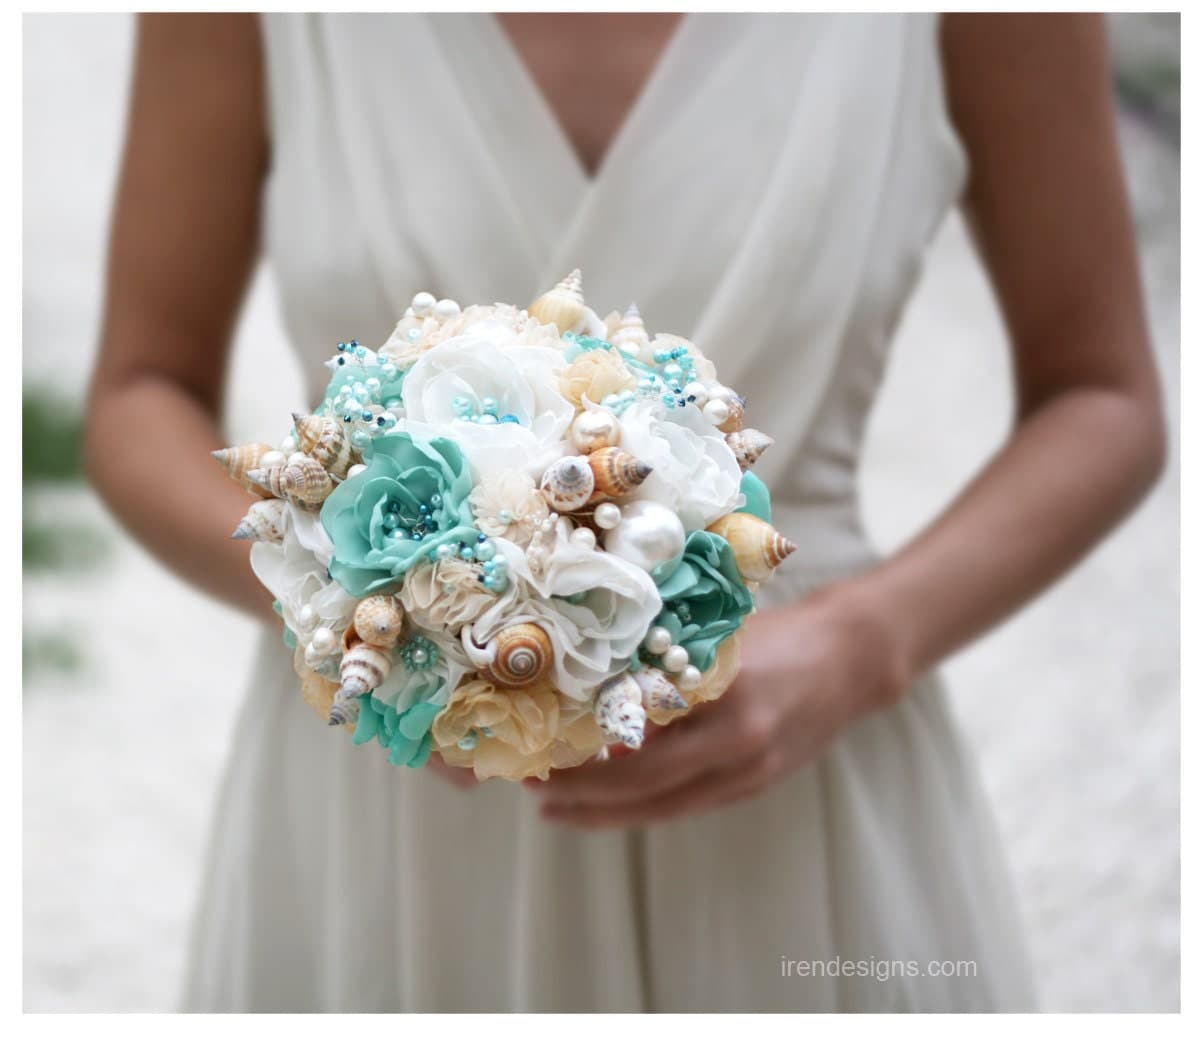 Beach Wedding Flowers: Seashells Wedding Bouquet For Beach Wedding. By IrenDesigns